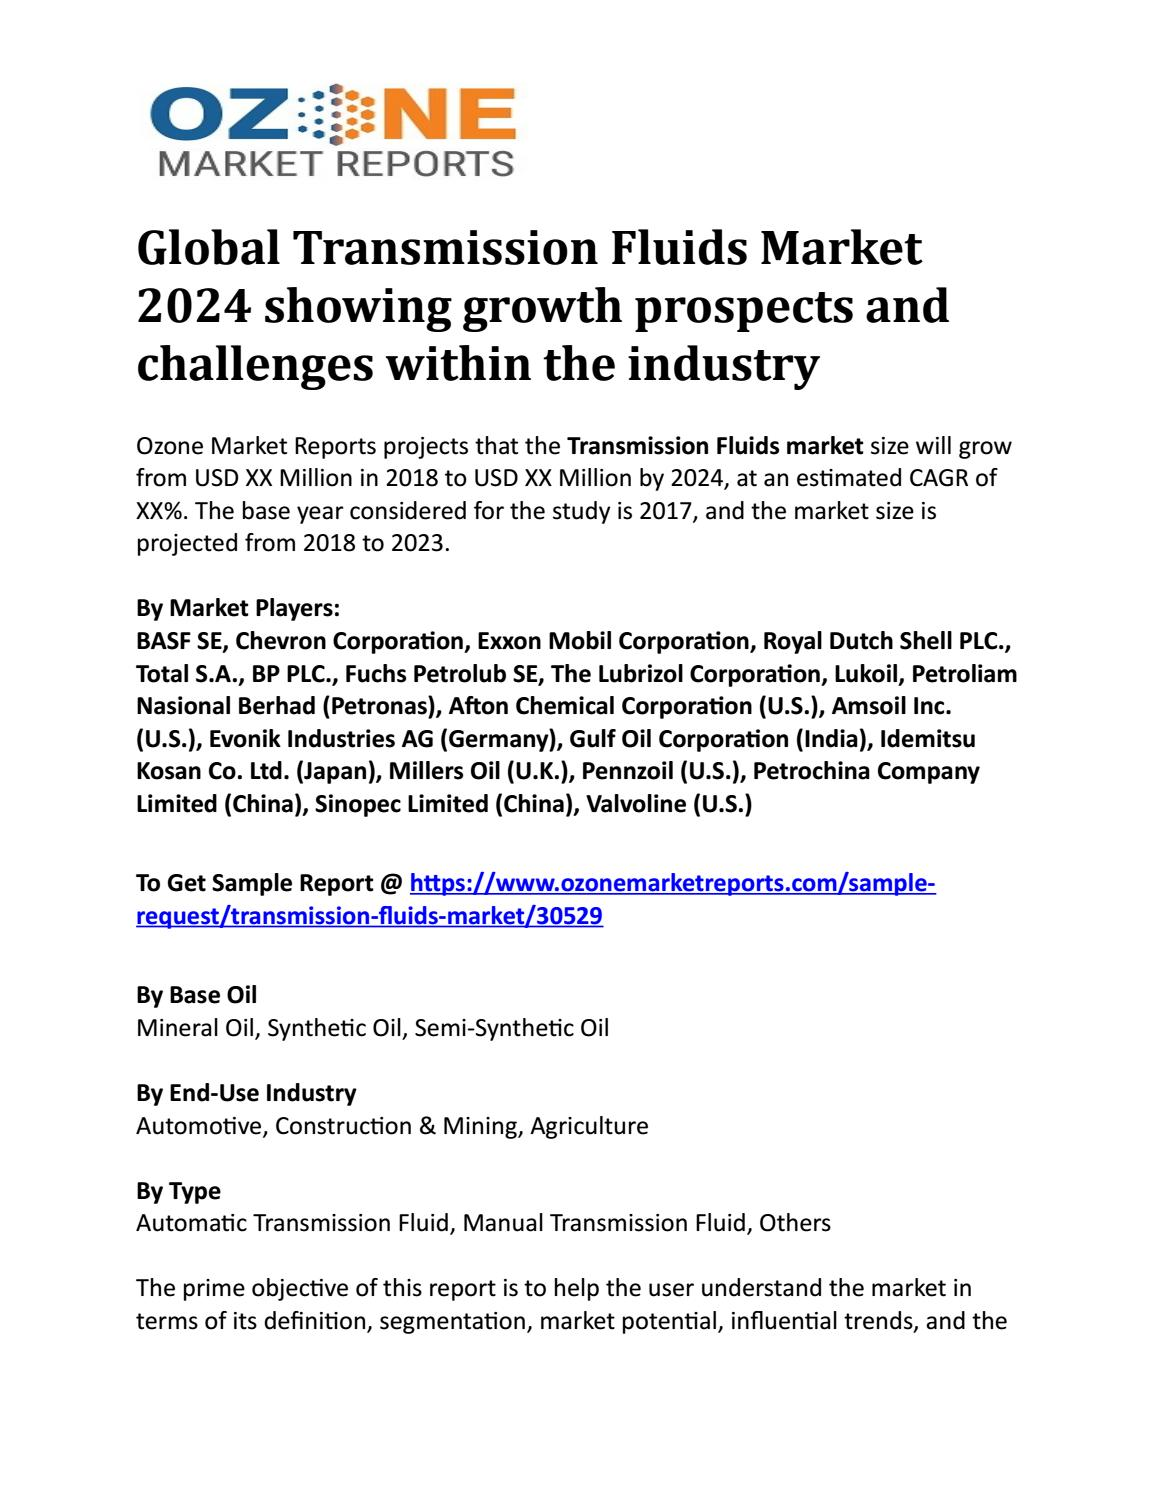 Global Transmission Fluids Market 2024 showing growth